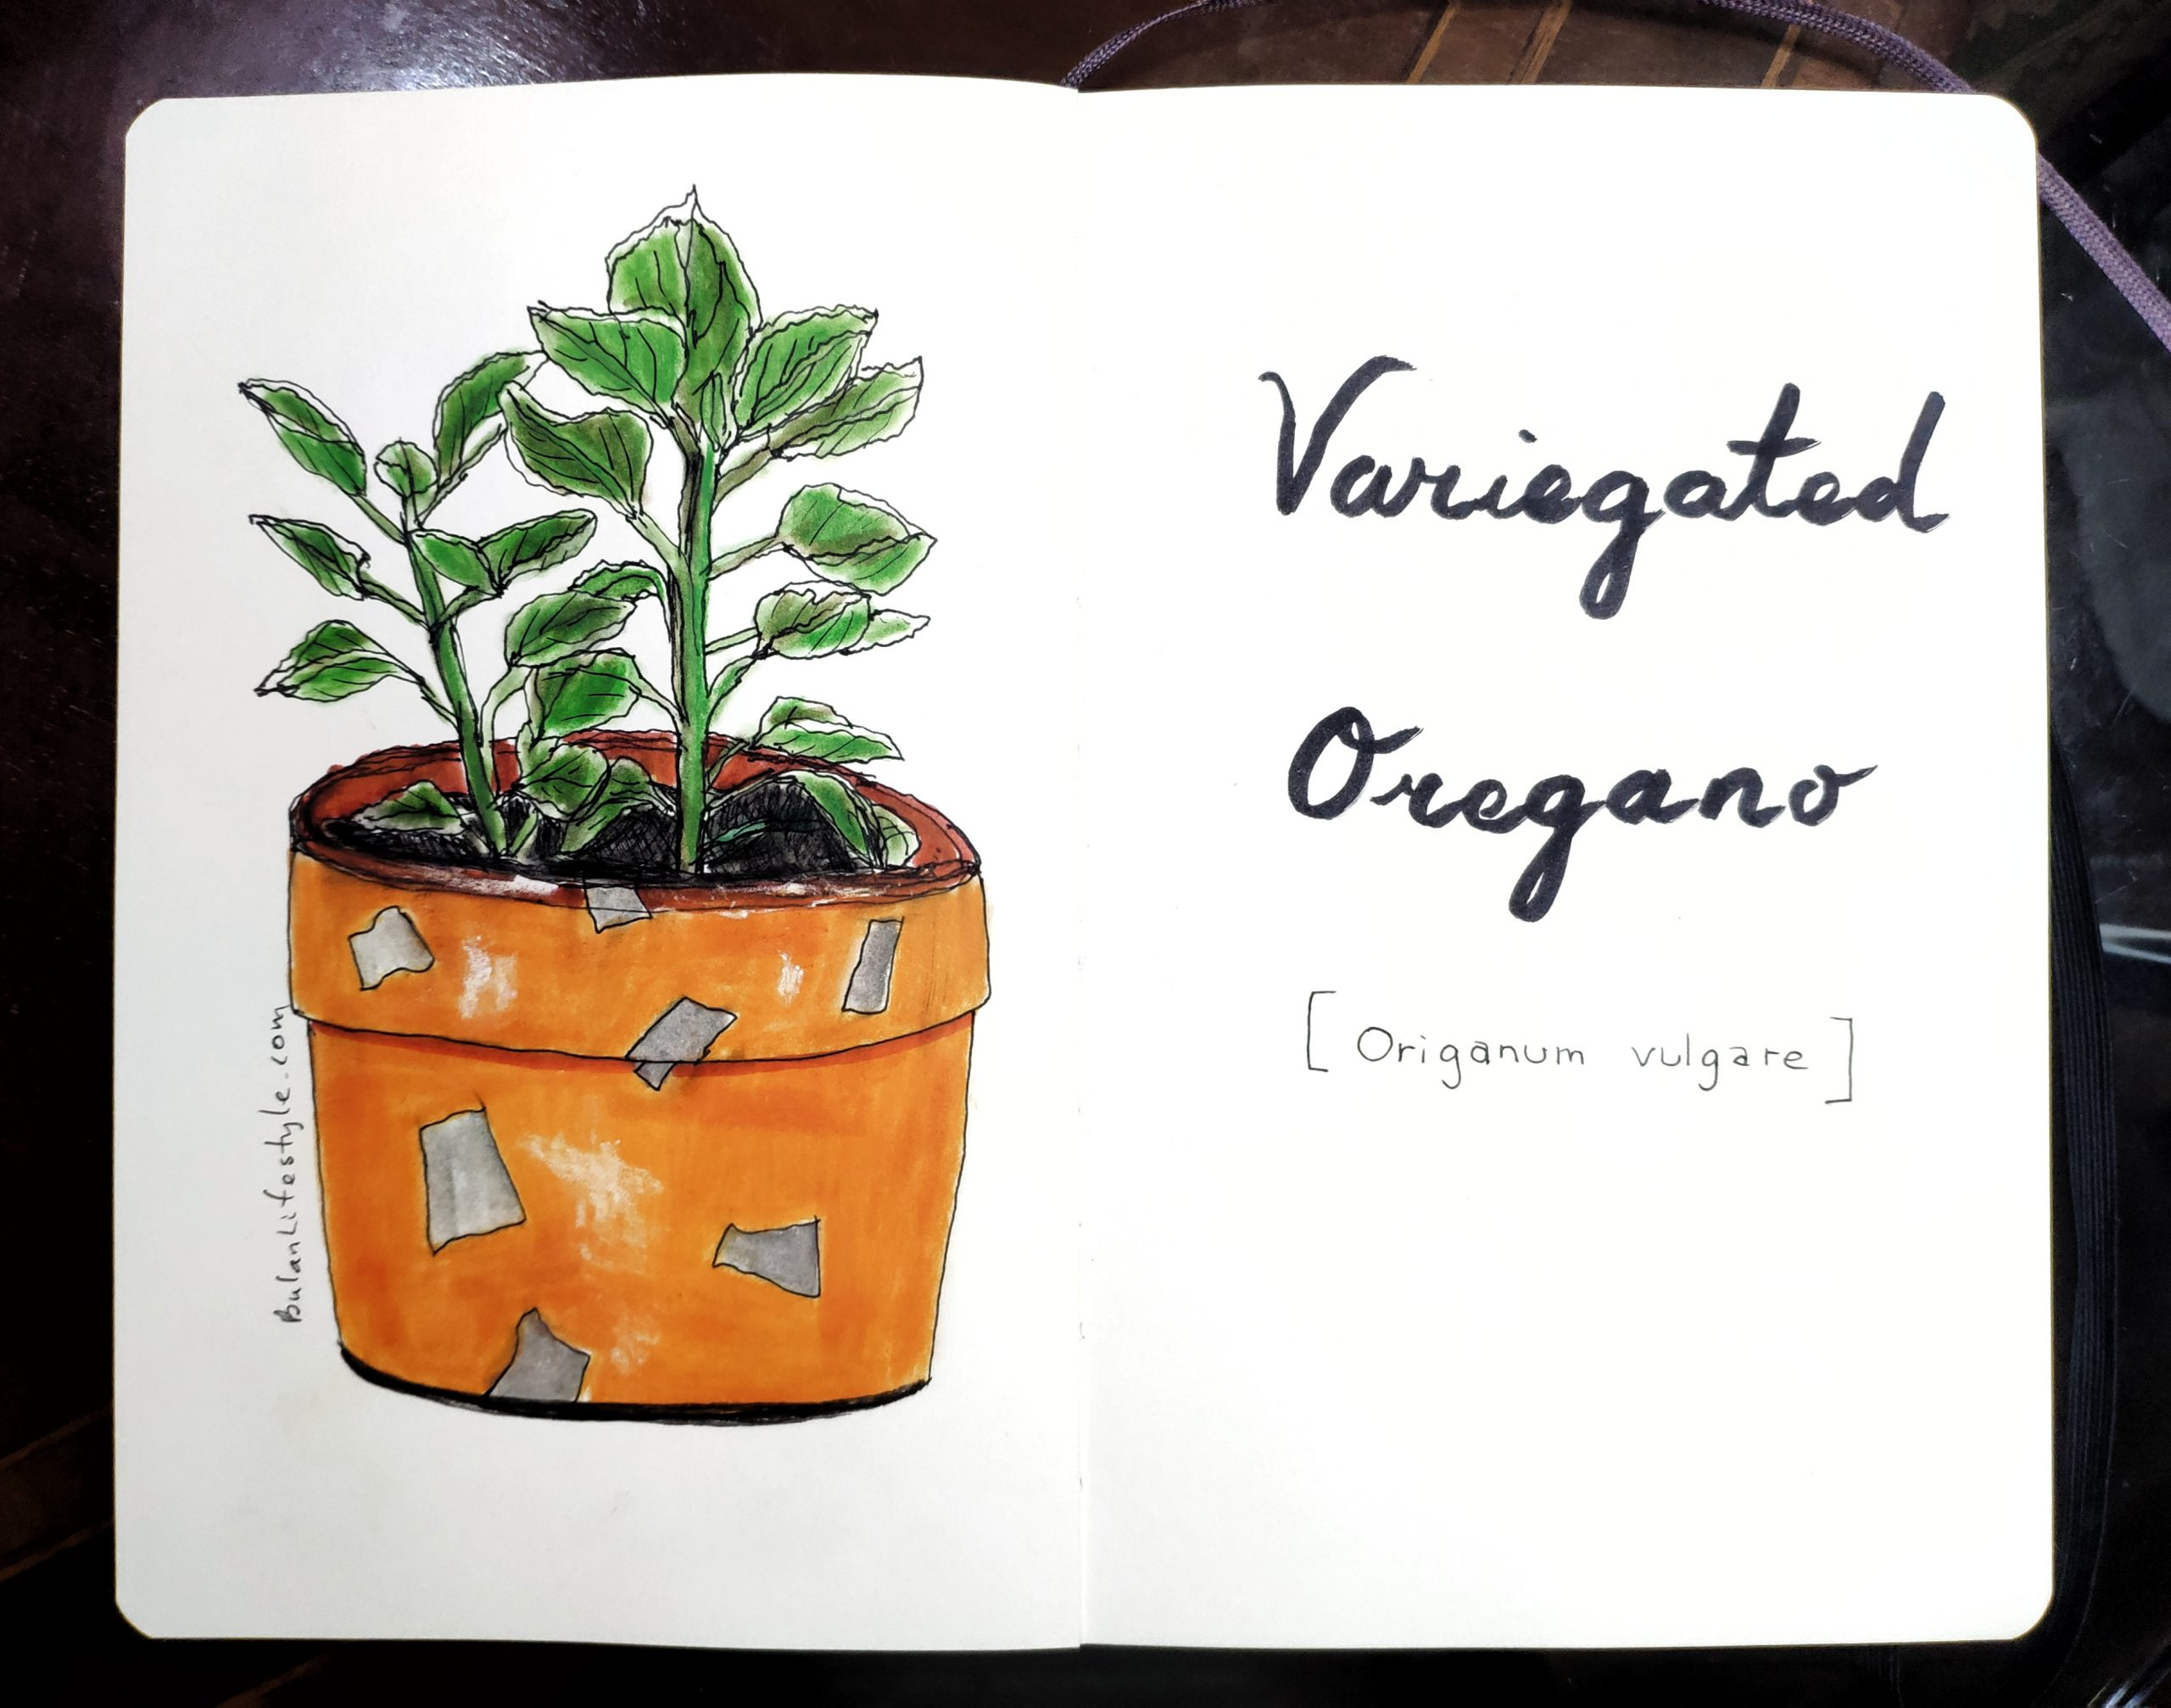 Variegated oregano